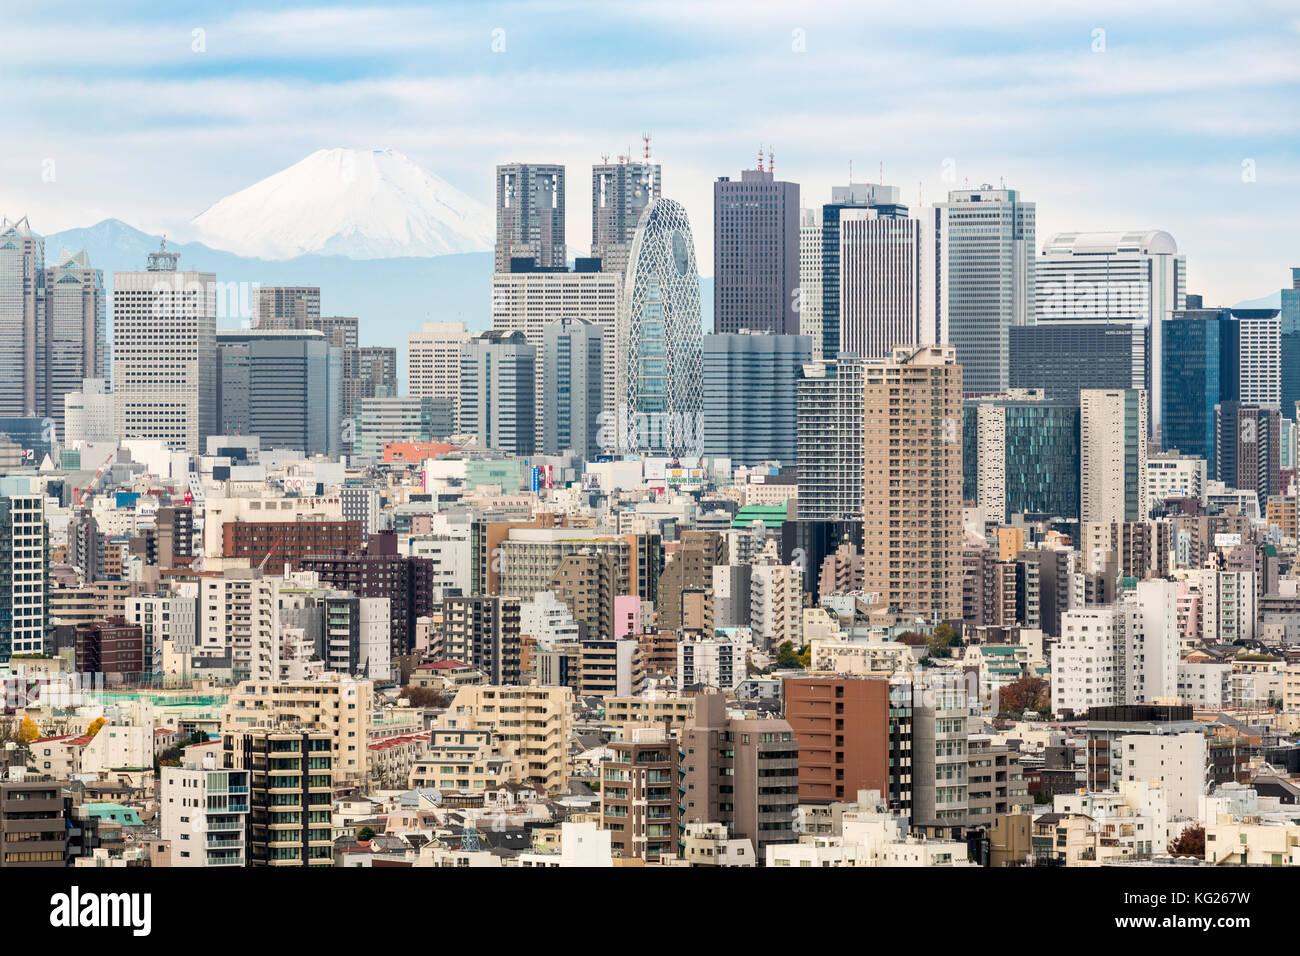 Mount Fuji and the Shinjuku district skyscraper skyline, Tokyo, Japan, Asia - Stock Image